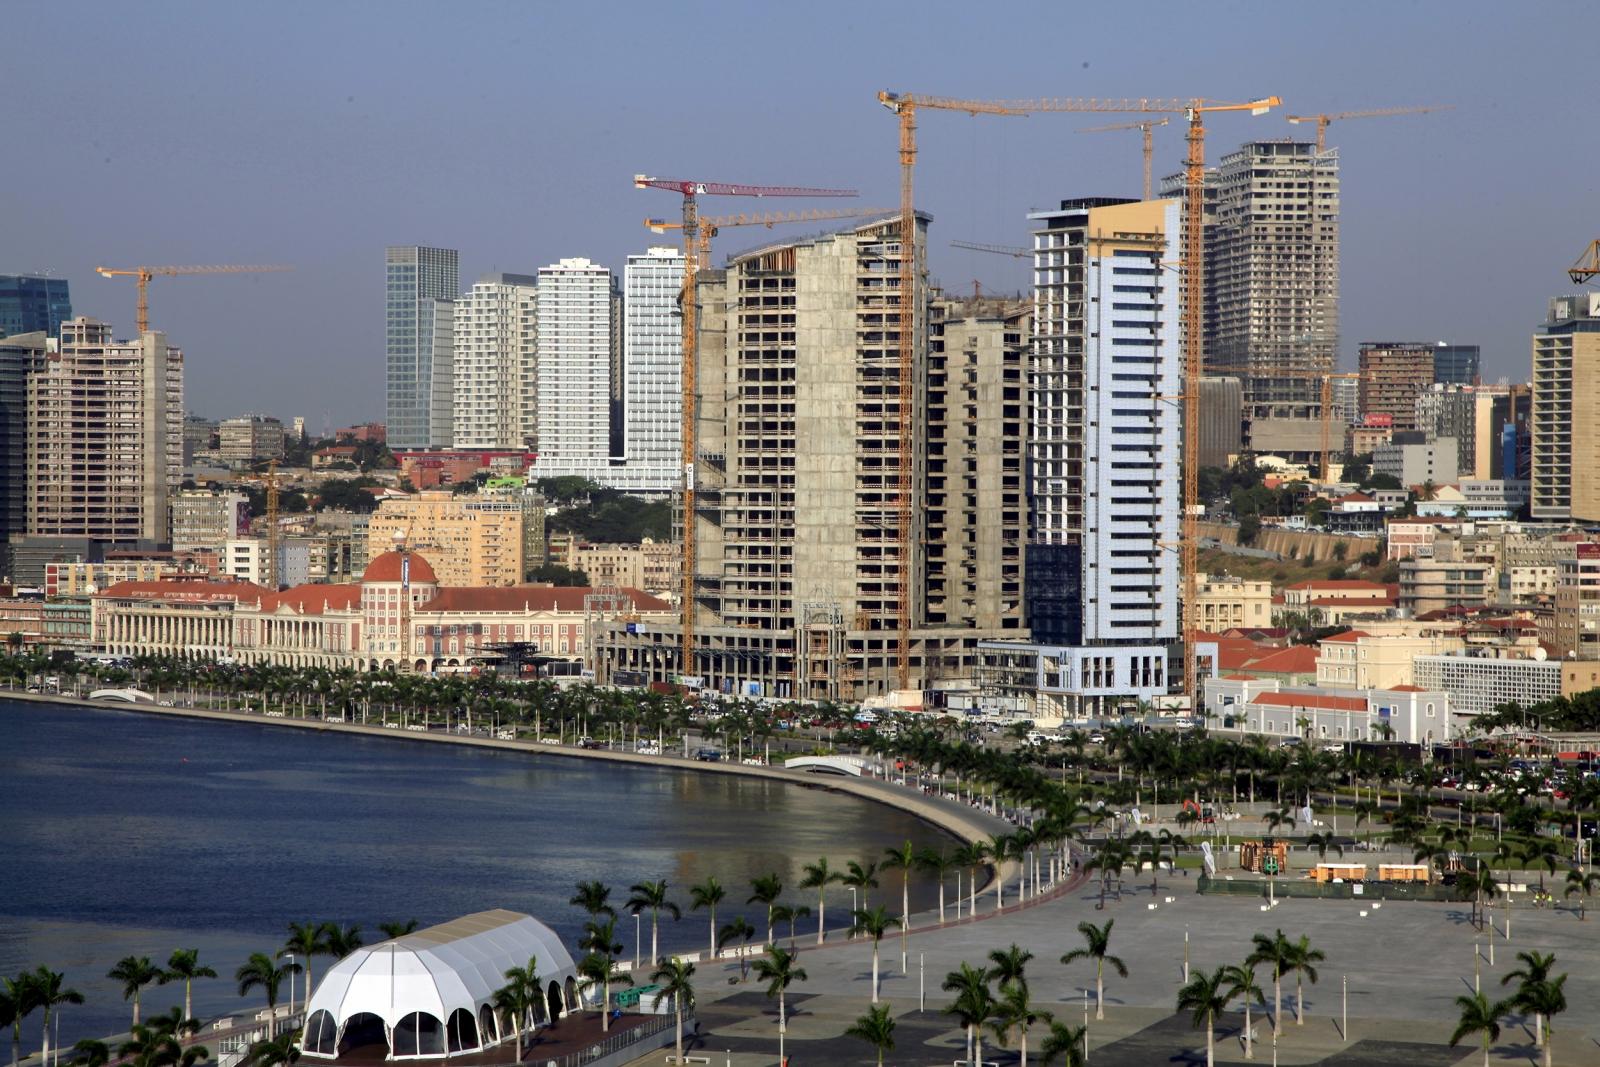 Luanda, Angola's capital